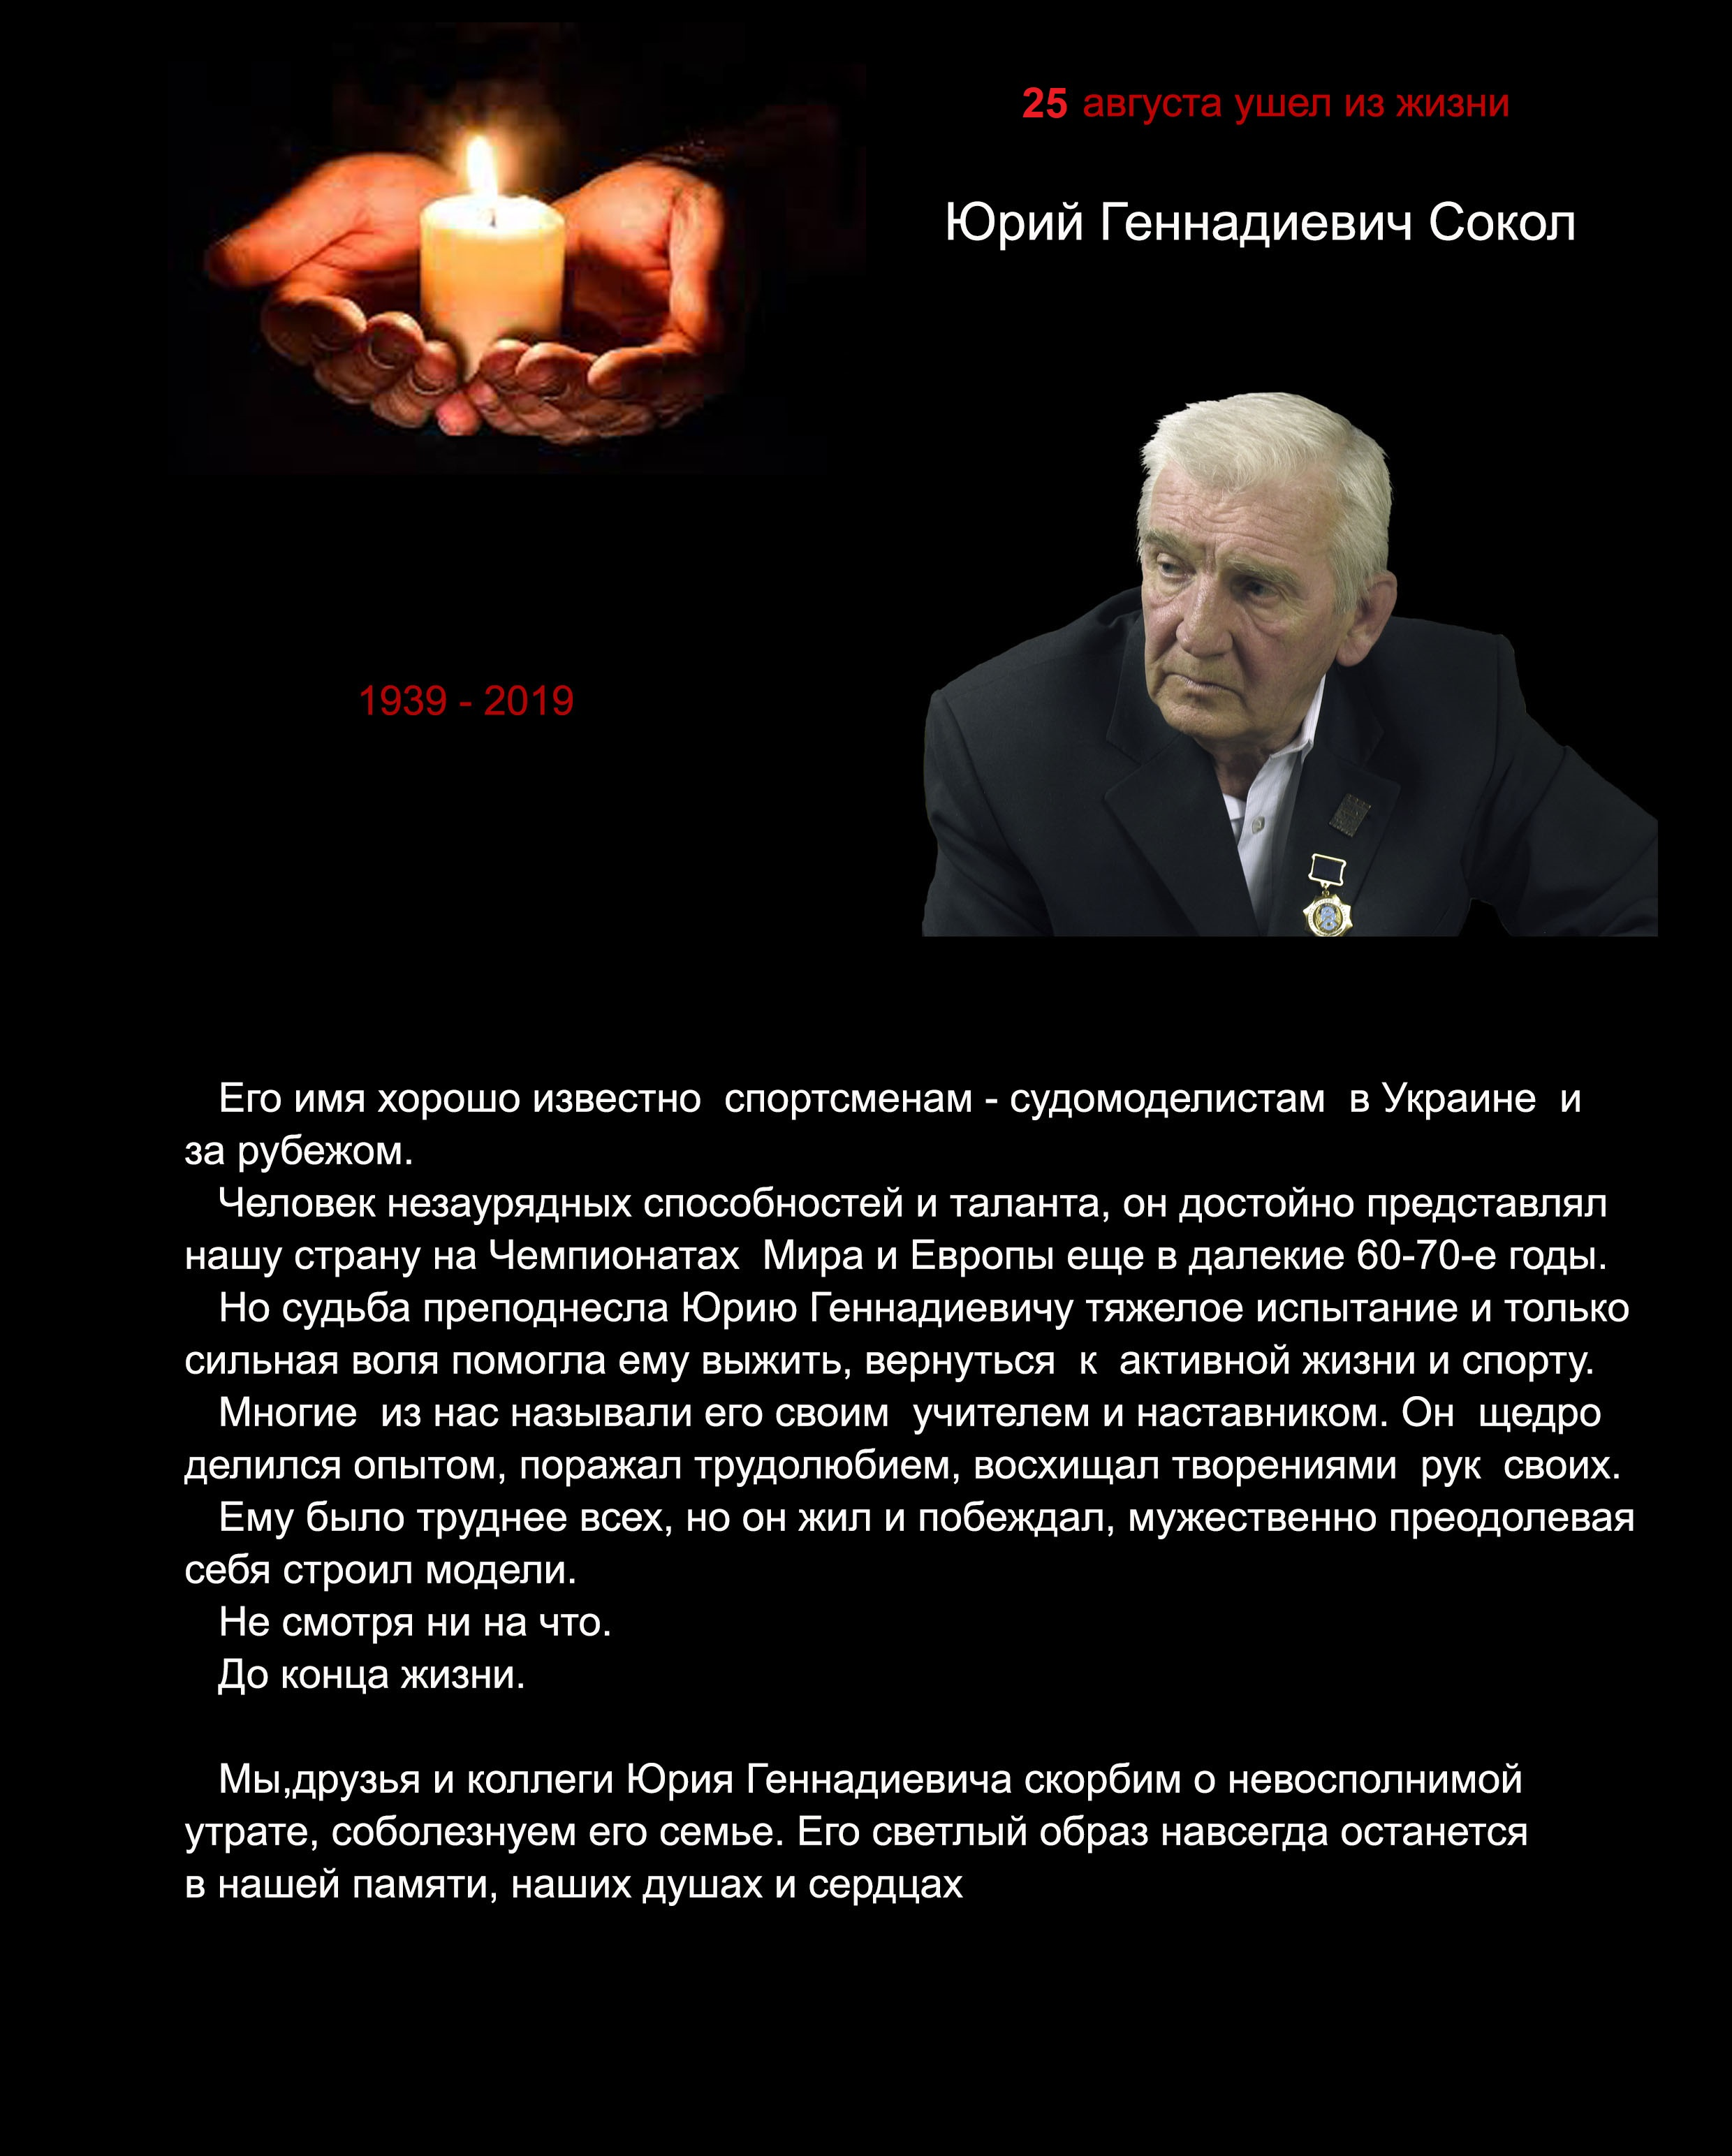 sokol_nekrolog